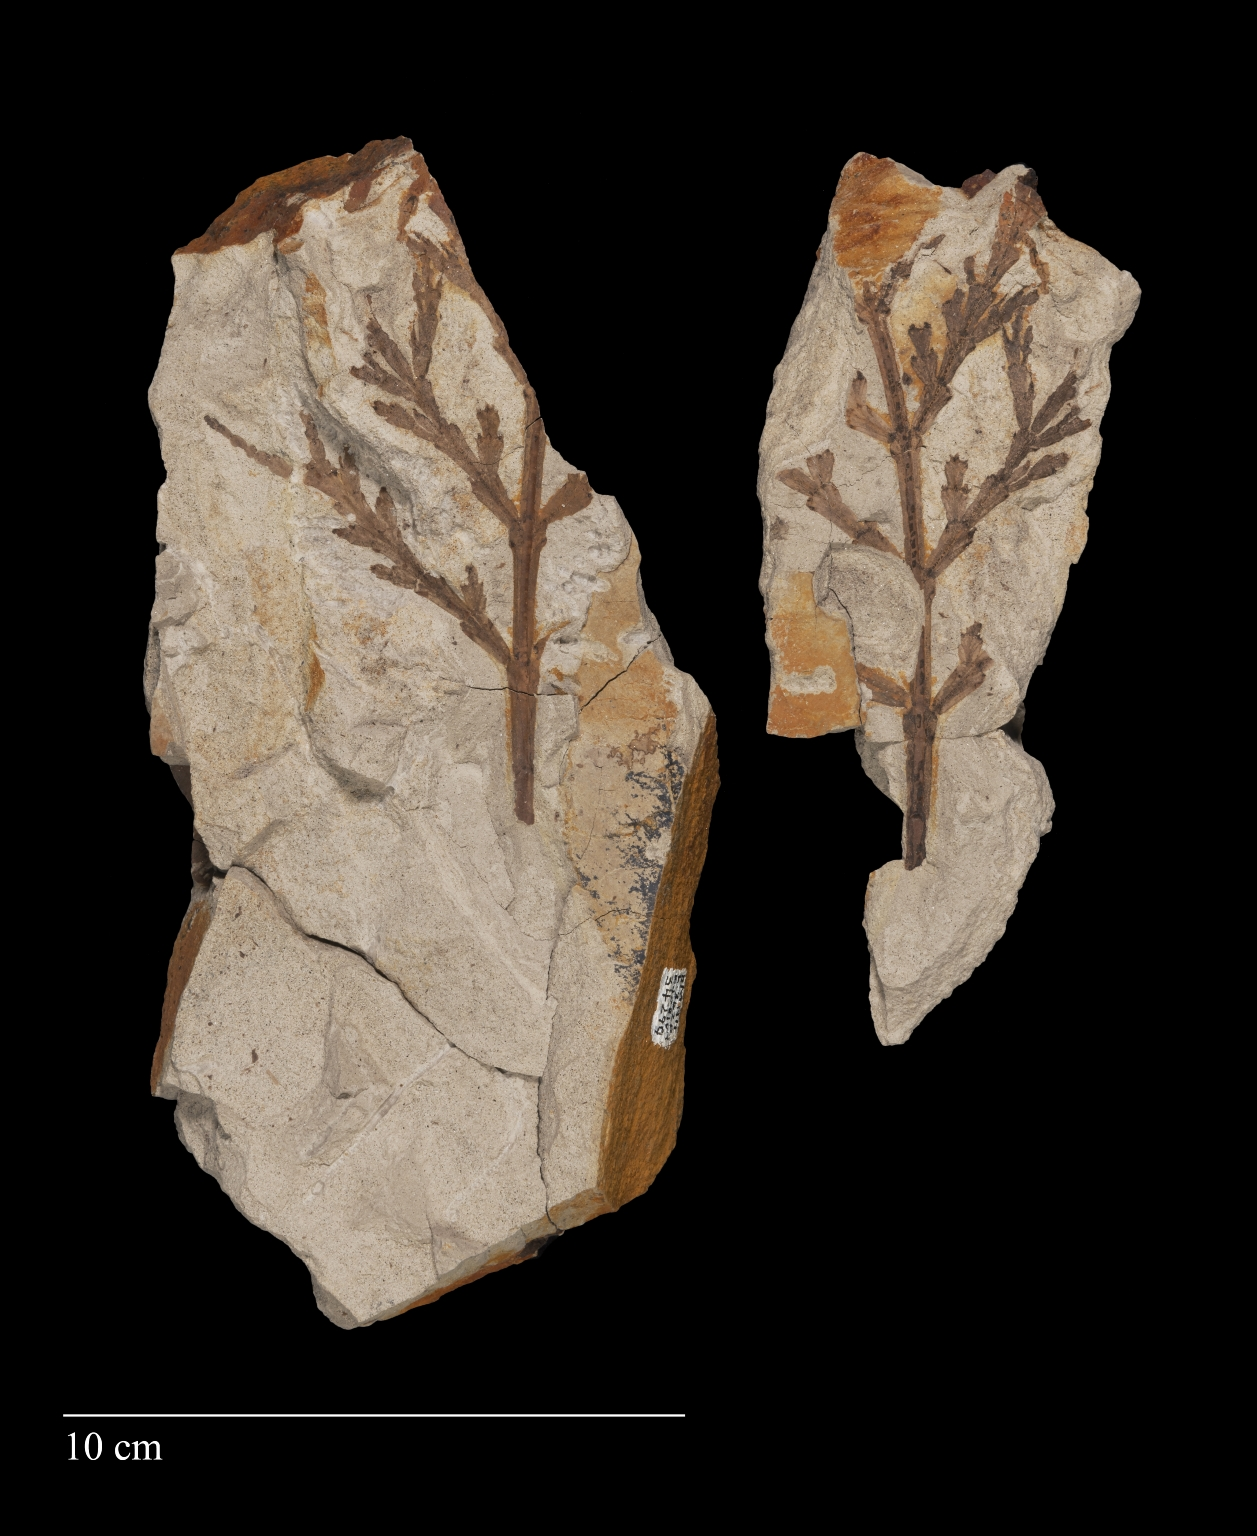 Fossil leaf and twig